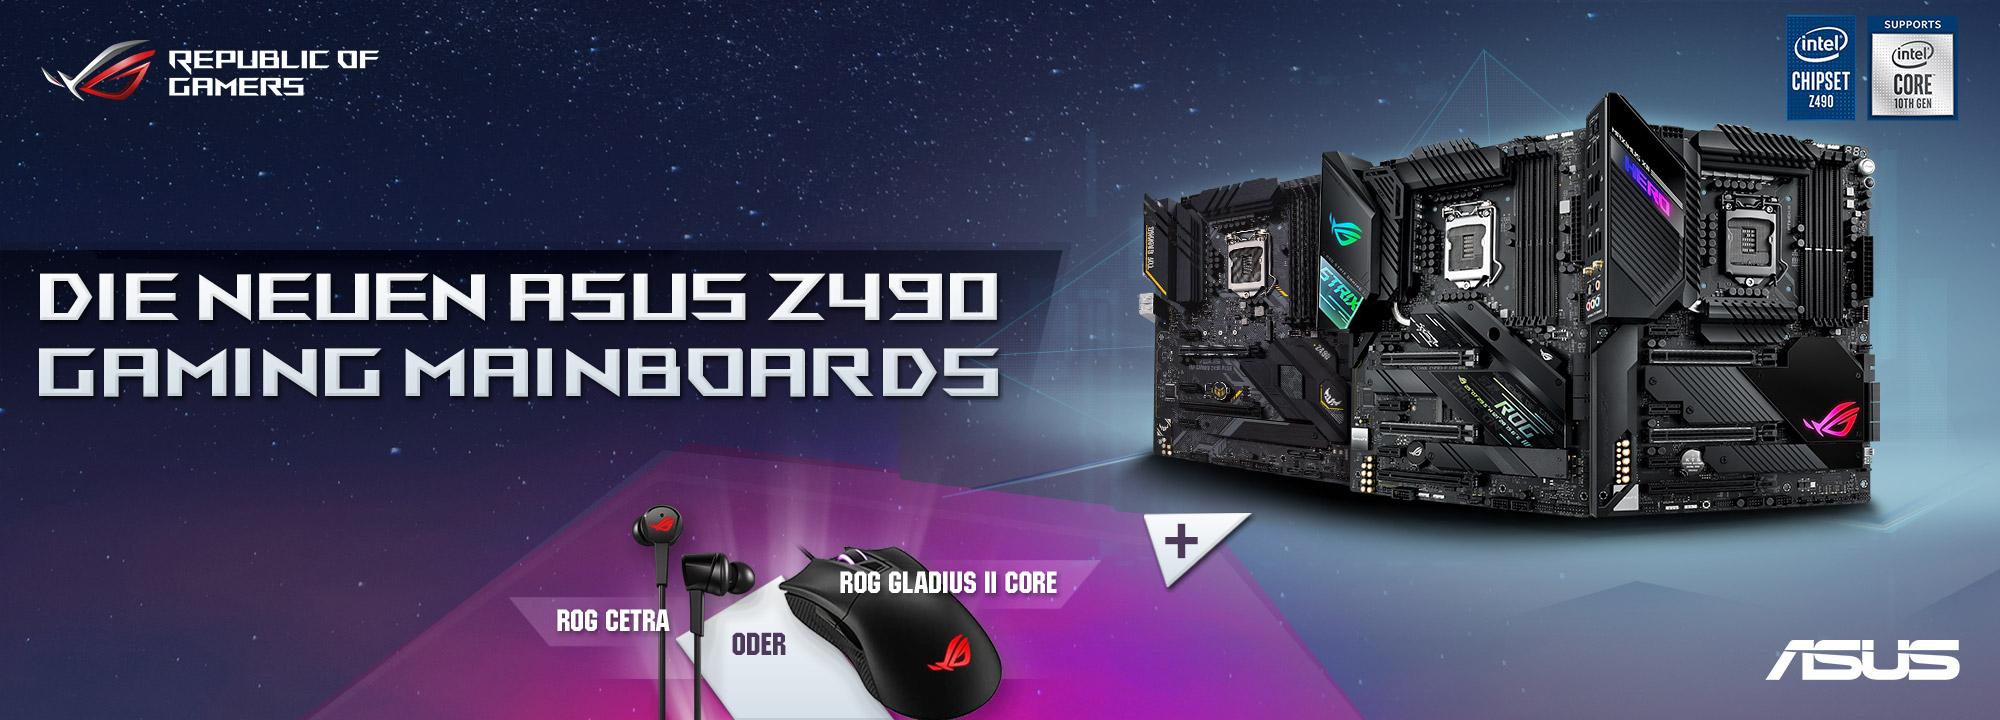 ASUS Bundle Promotion für Z490 Mainboards (Intel Core 10. Generation) - In-Ear-Kopfhörer oder Gaming Maus gratis